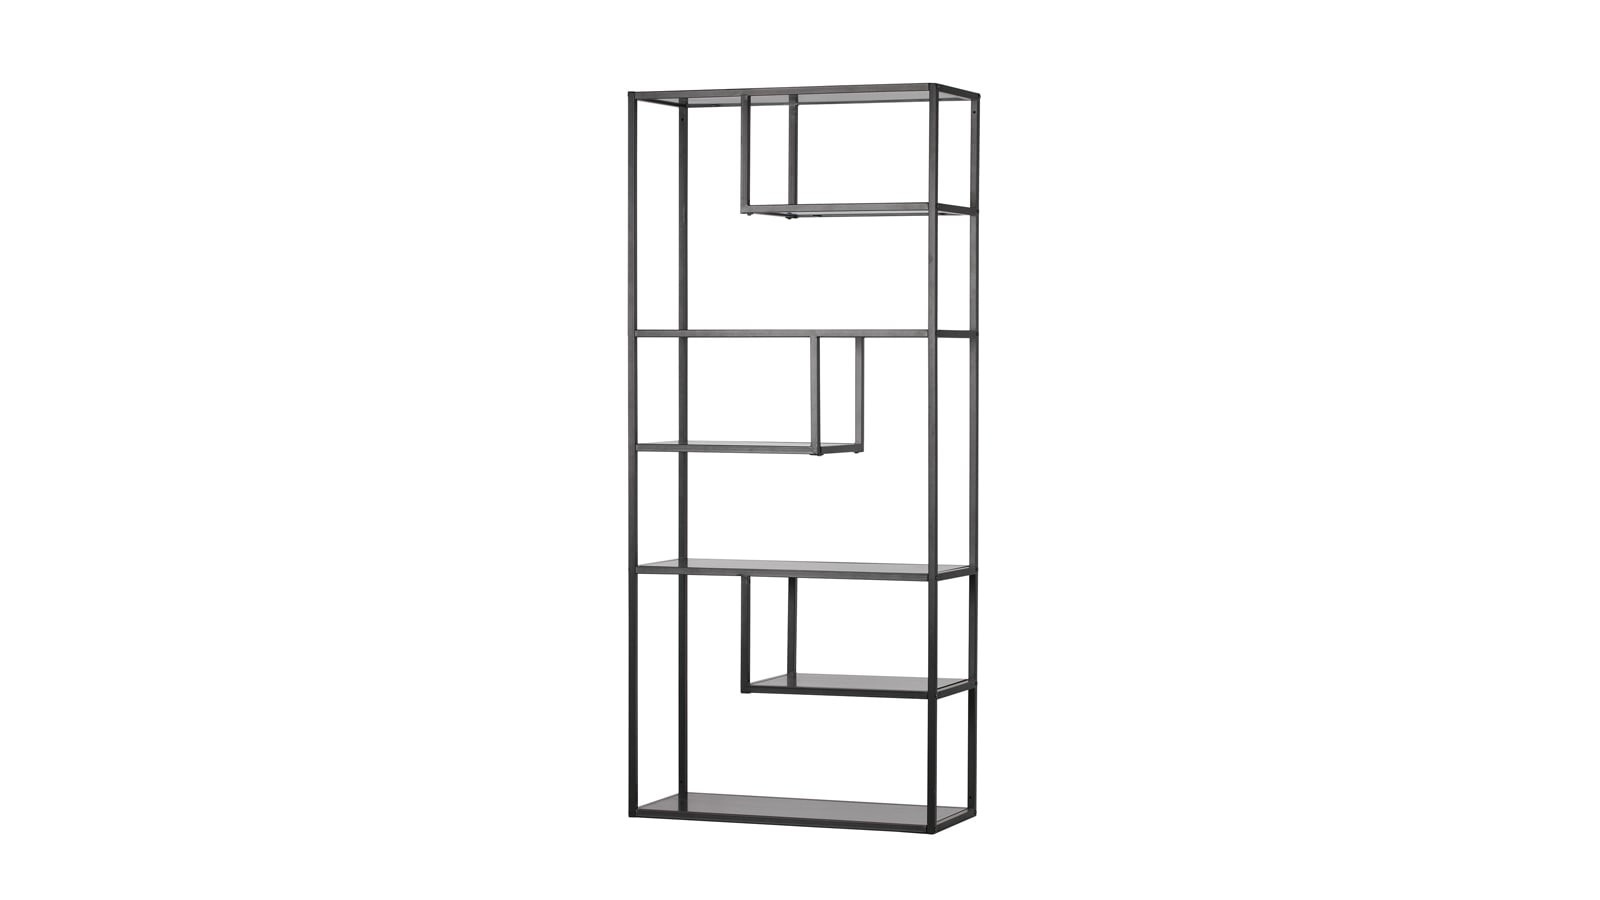 biblioth que cases en m tal noir collection teun homifab. Black Bedroom Furniture Sets. Home Design Ideas